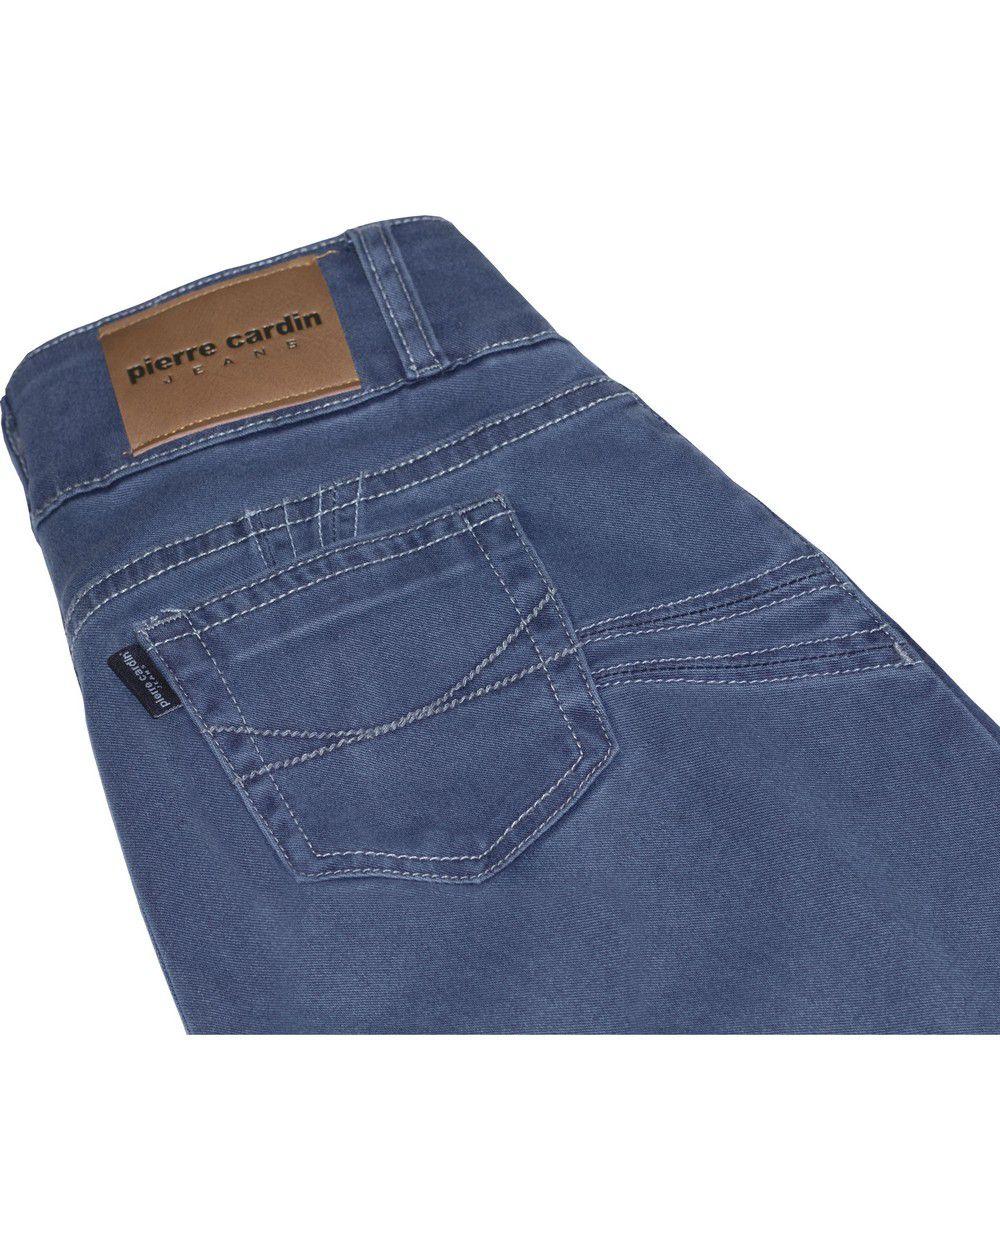 450 Skinny Jeans Blue Bird